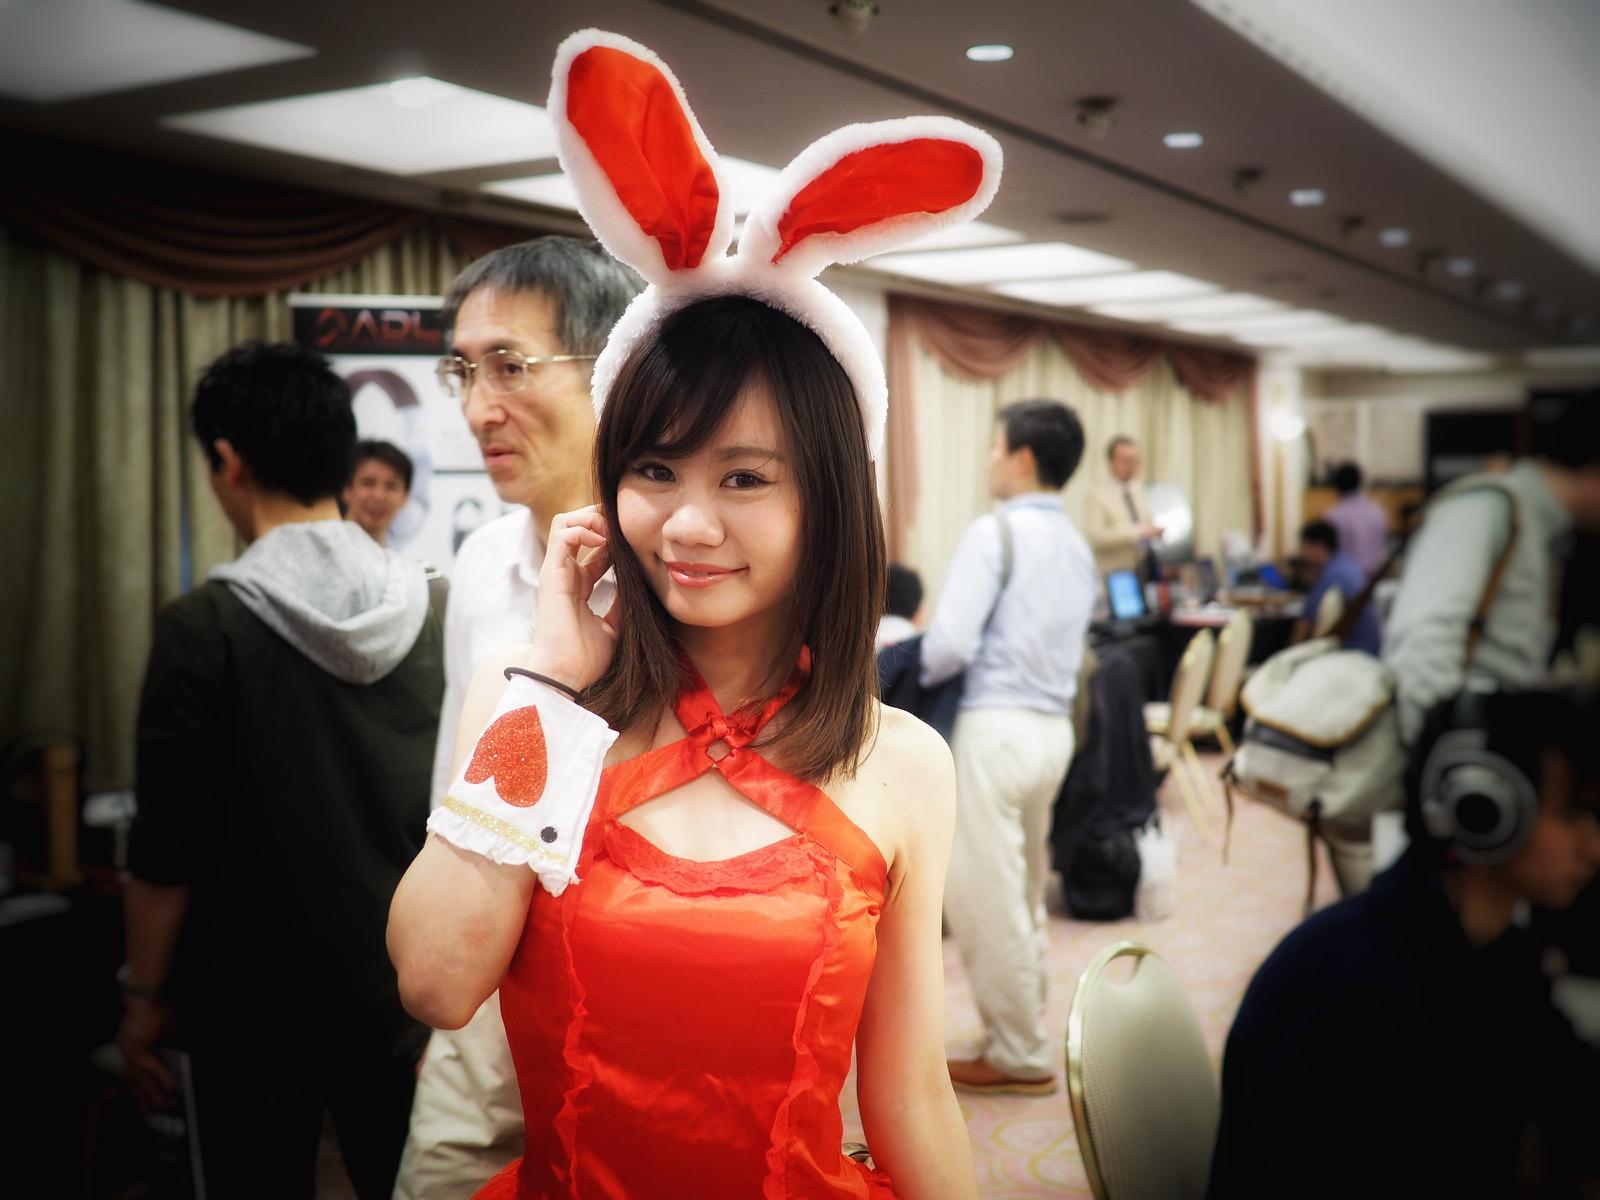 Photo 2017-04-30 14 52 20.jpg